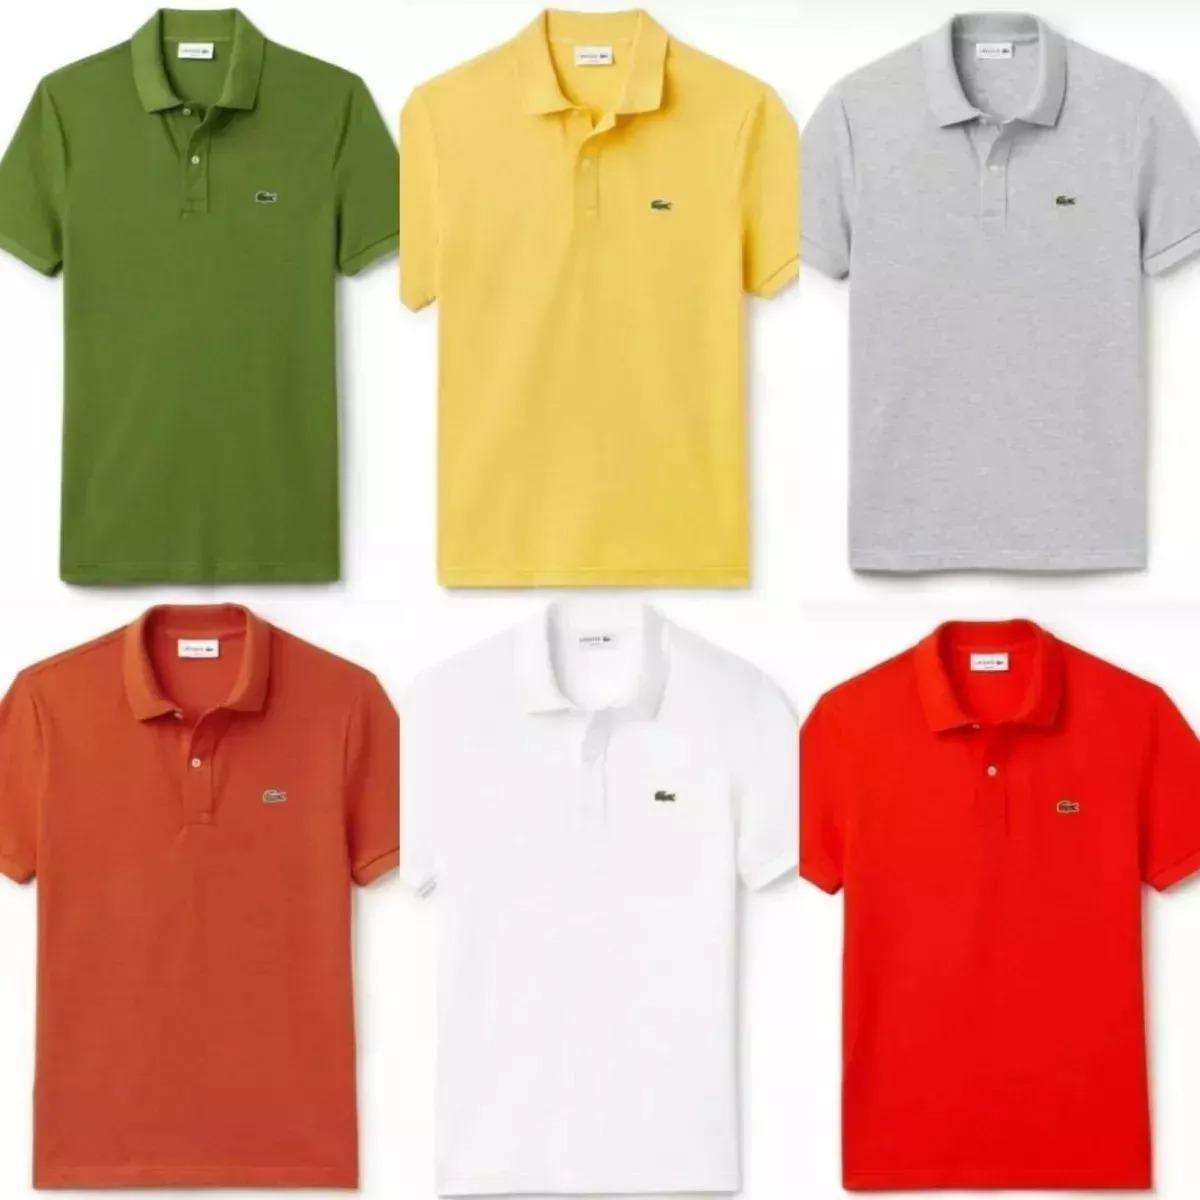 ... camisa polo masculina da lacoste mega oferta. Carregando zoom. 442dff9995db0